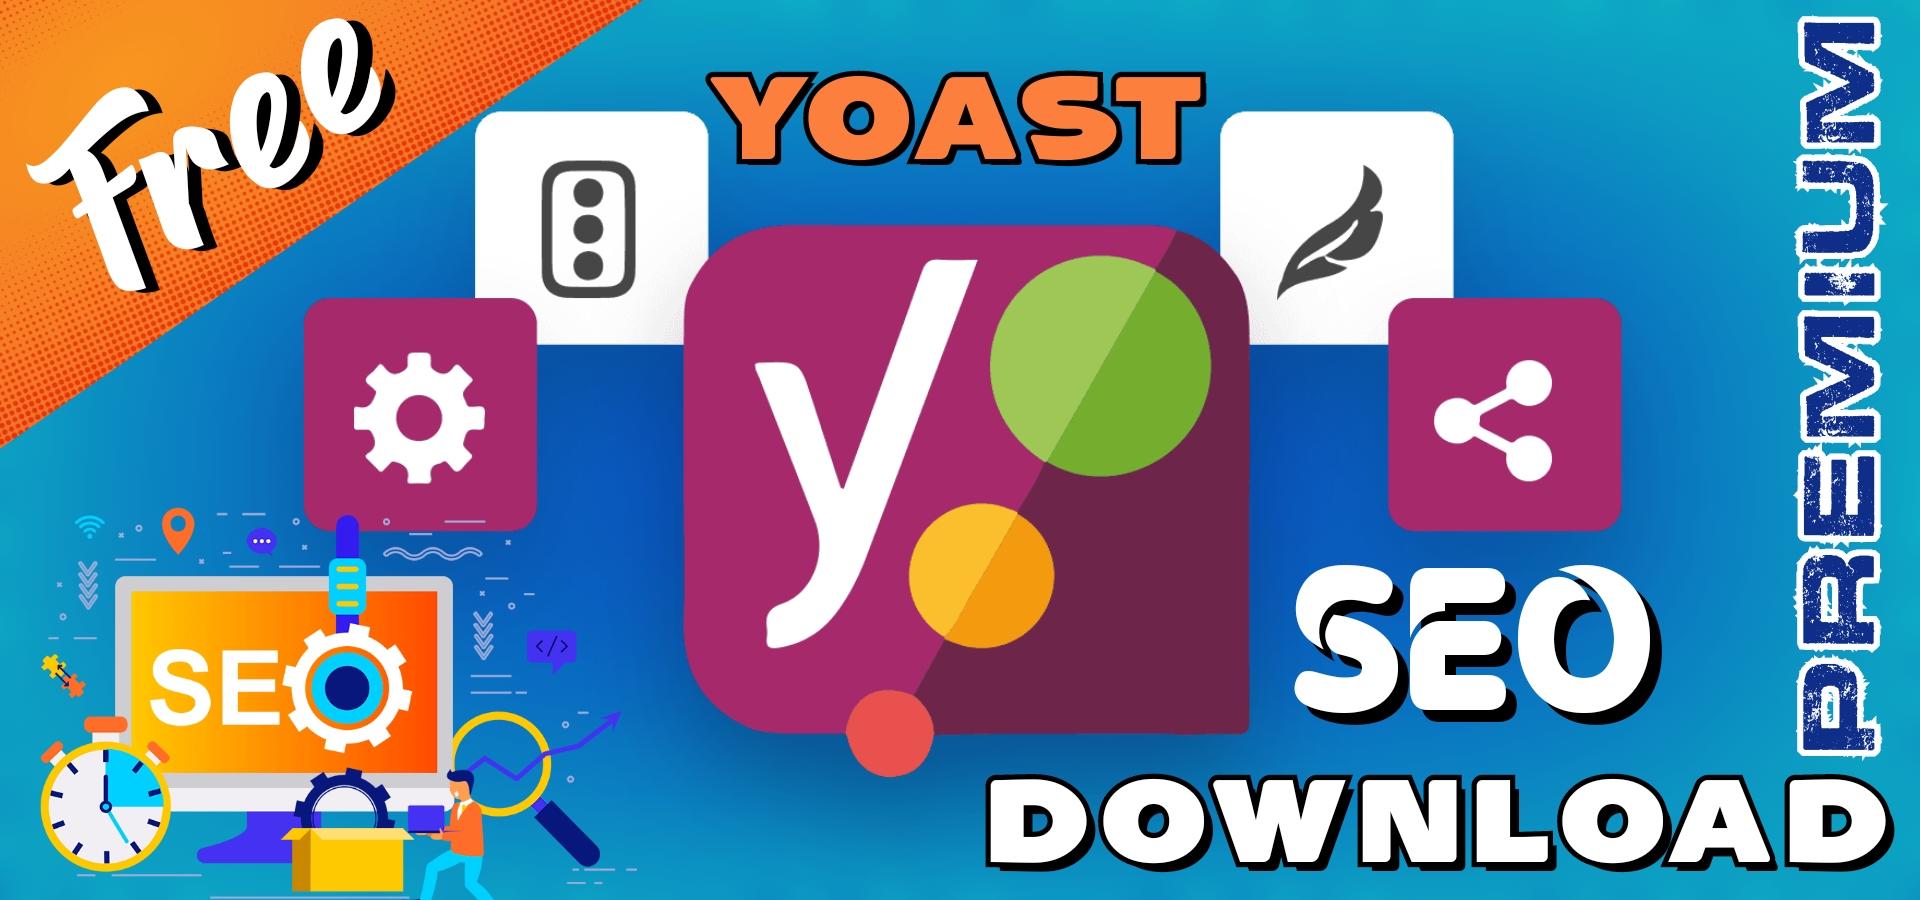 Yoast SEO Premium V15.8.2 Free Download Latest Version (Activated) Yoast SEO - Best Premium WordPress SEO Plugin